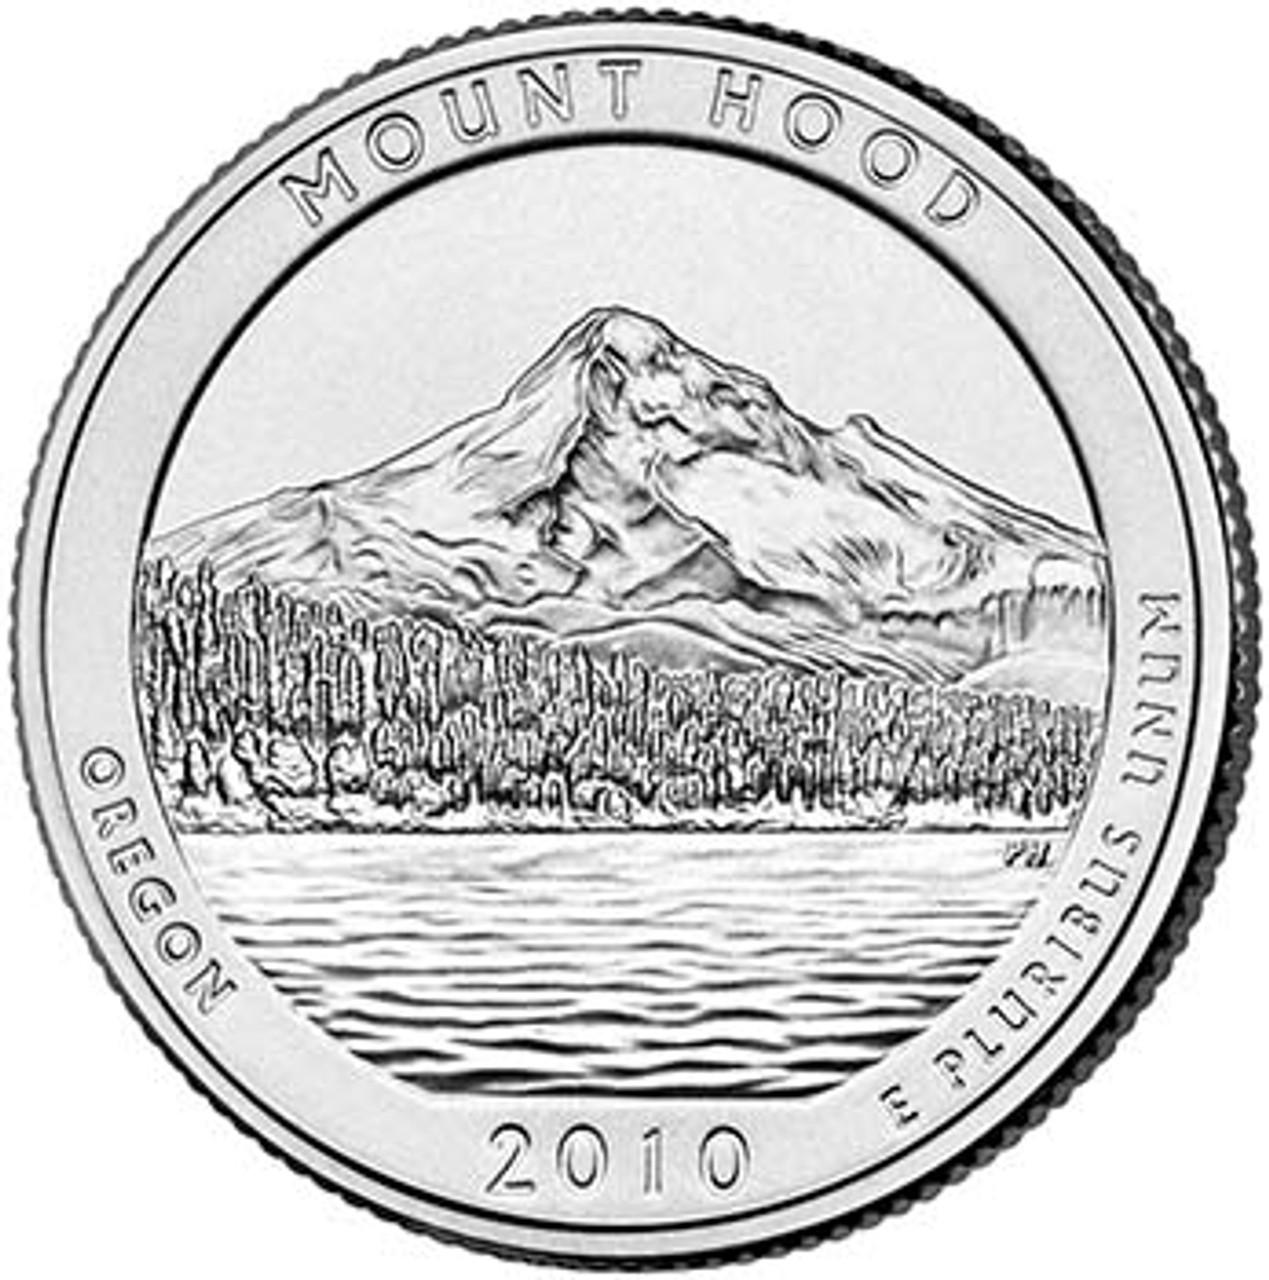 2010-P Mount Hood National Forest Quarter Brilliant Uncirculated Image 1